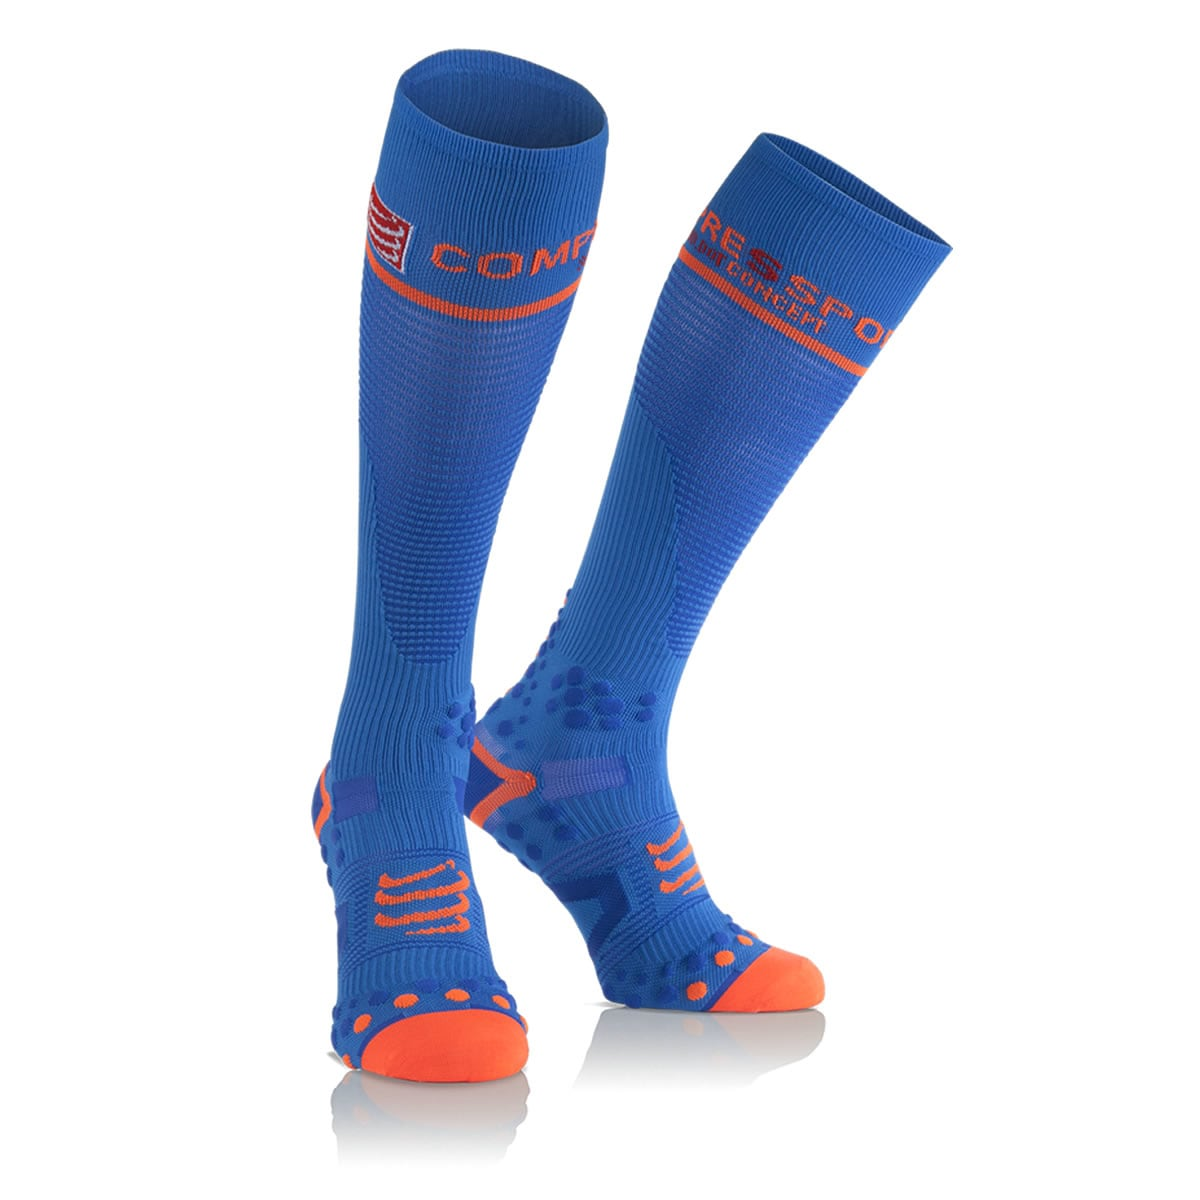 Full Socks V2.1 unisex - Compressport - blau